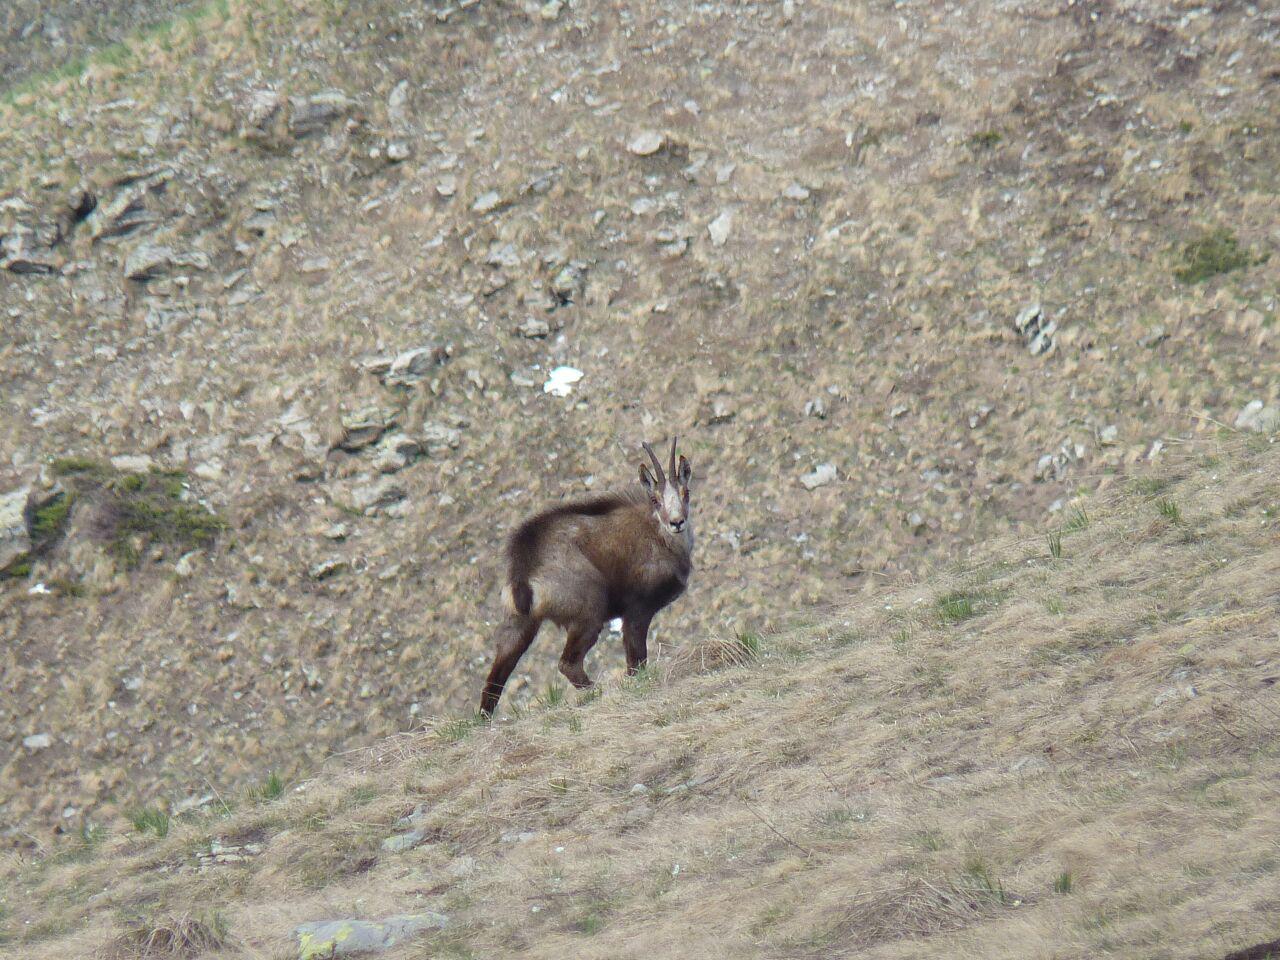 sempre elegante vederlo muoversi in montagna